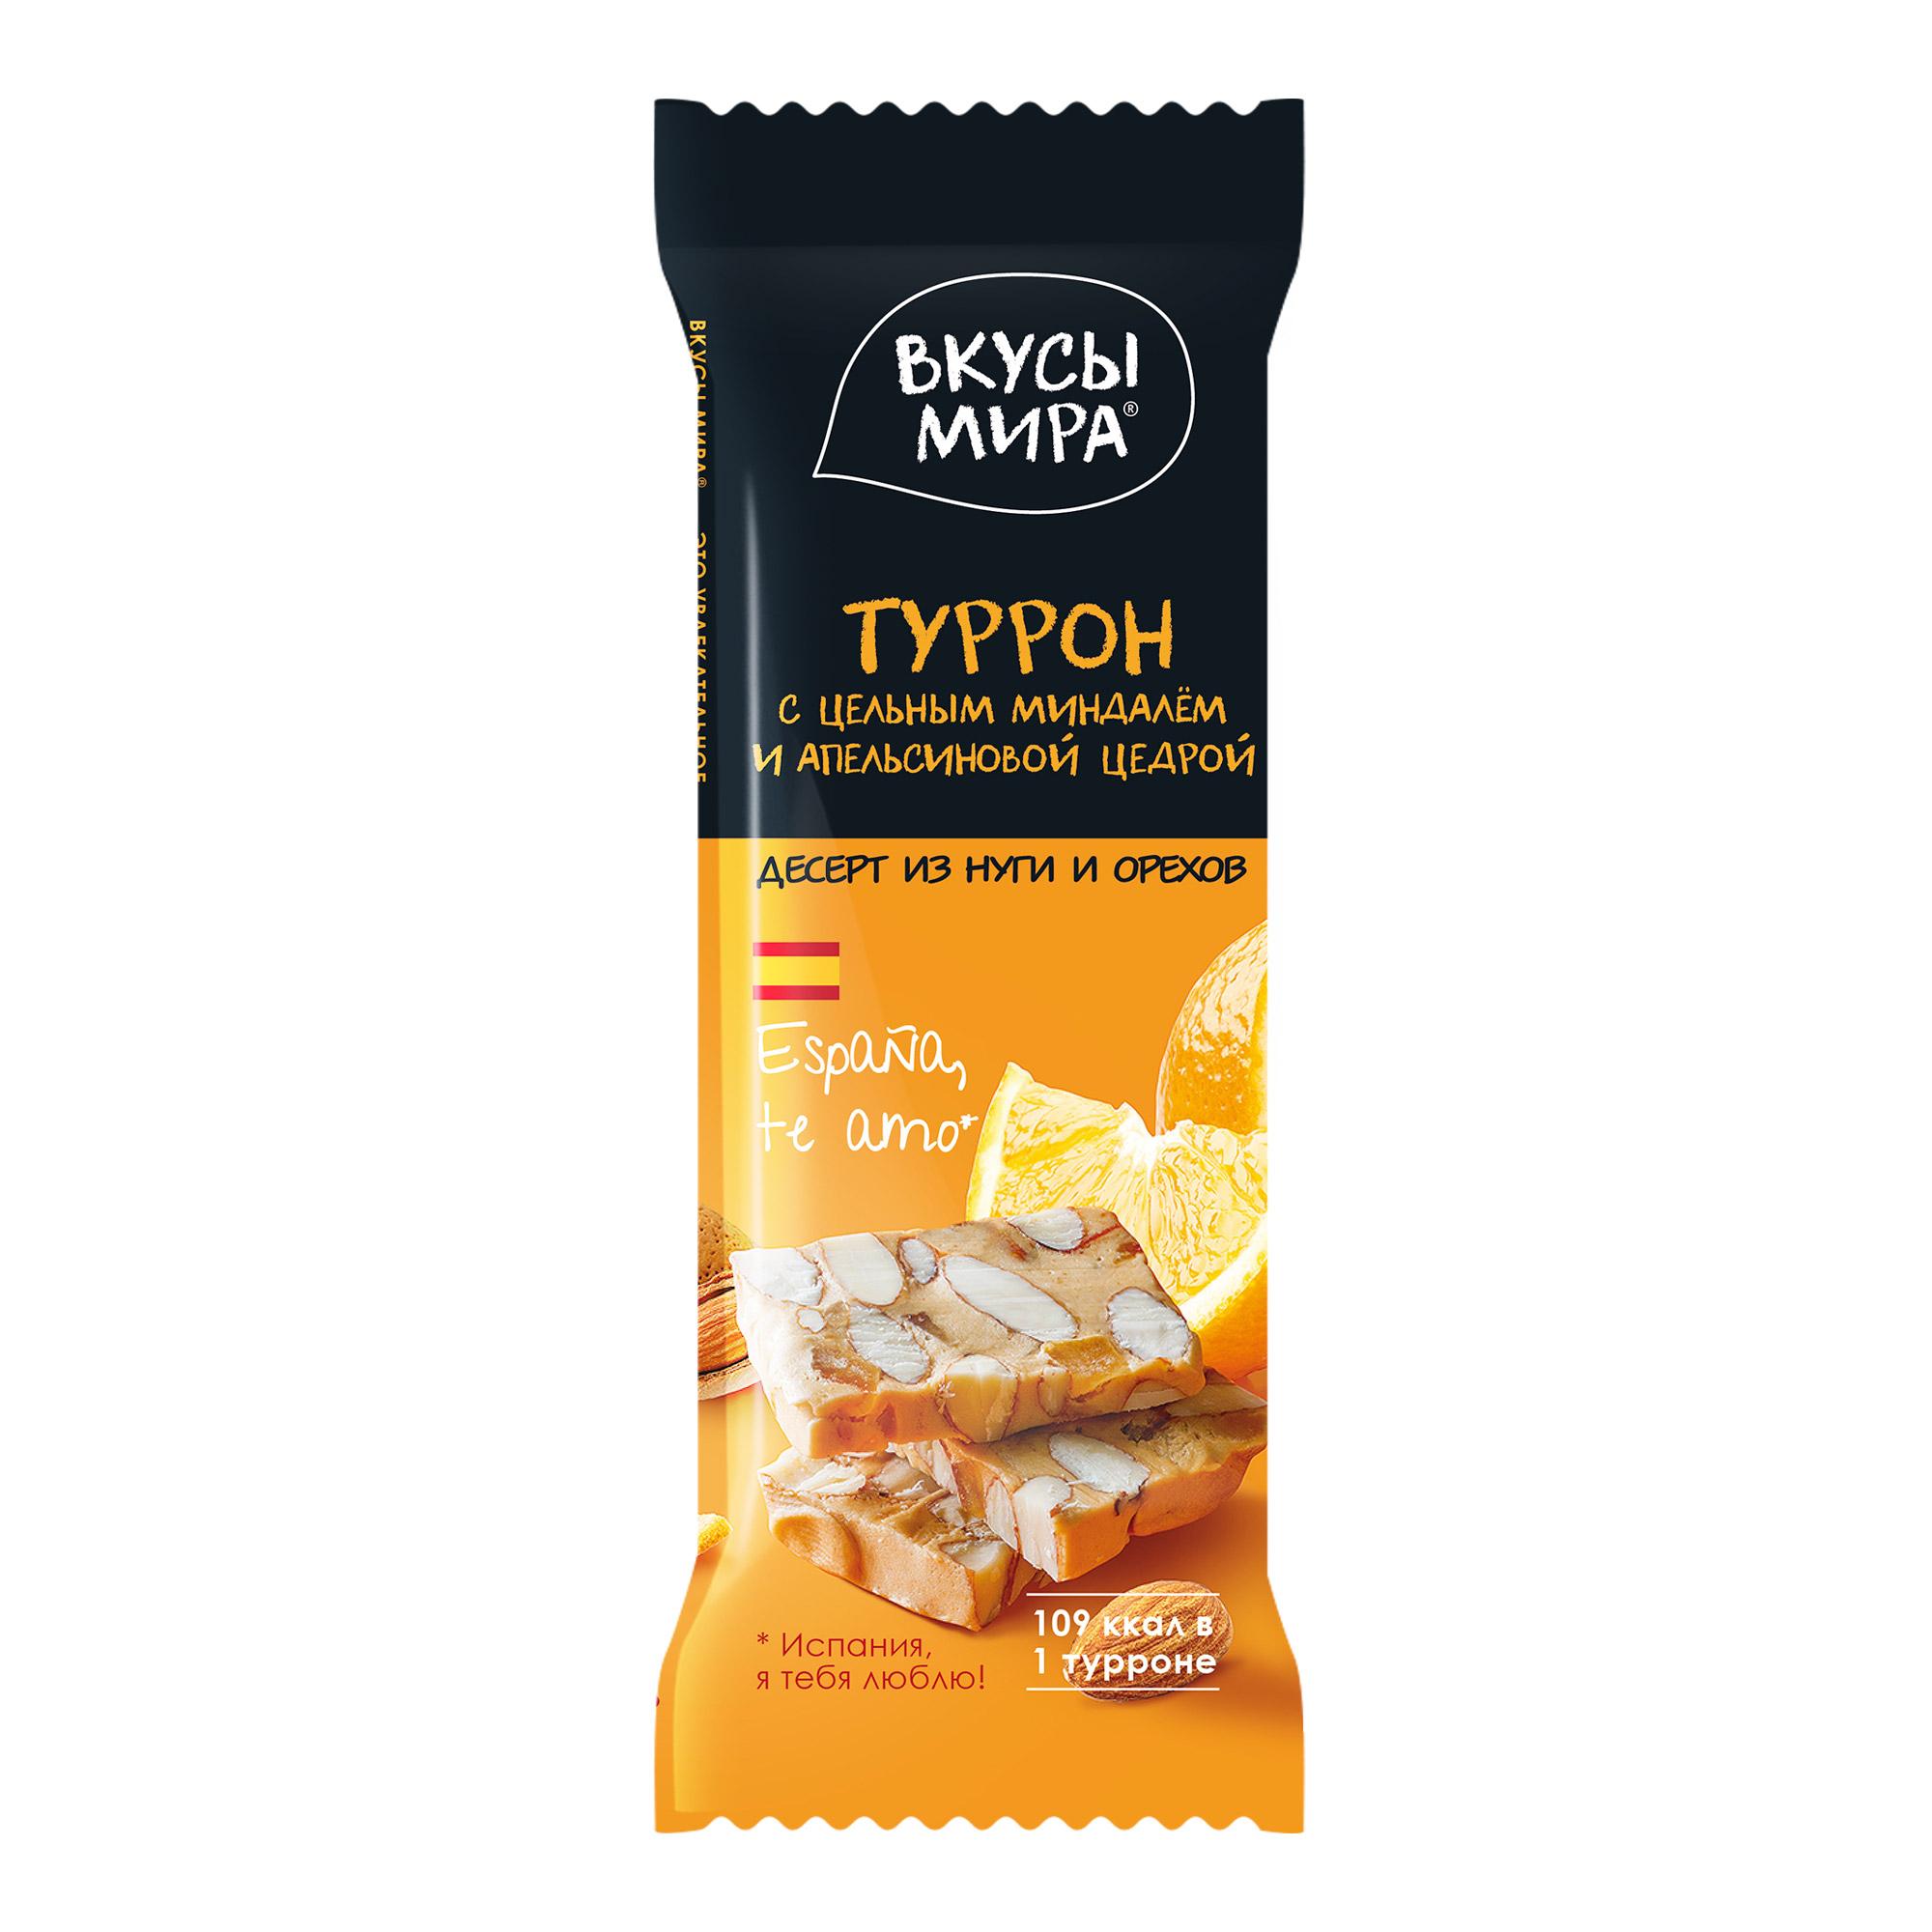 Фото - Туррон Вкусы мира Миндаль и апельсин 25 г туррон вкусы мира фундук и вишня 50 г